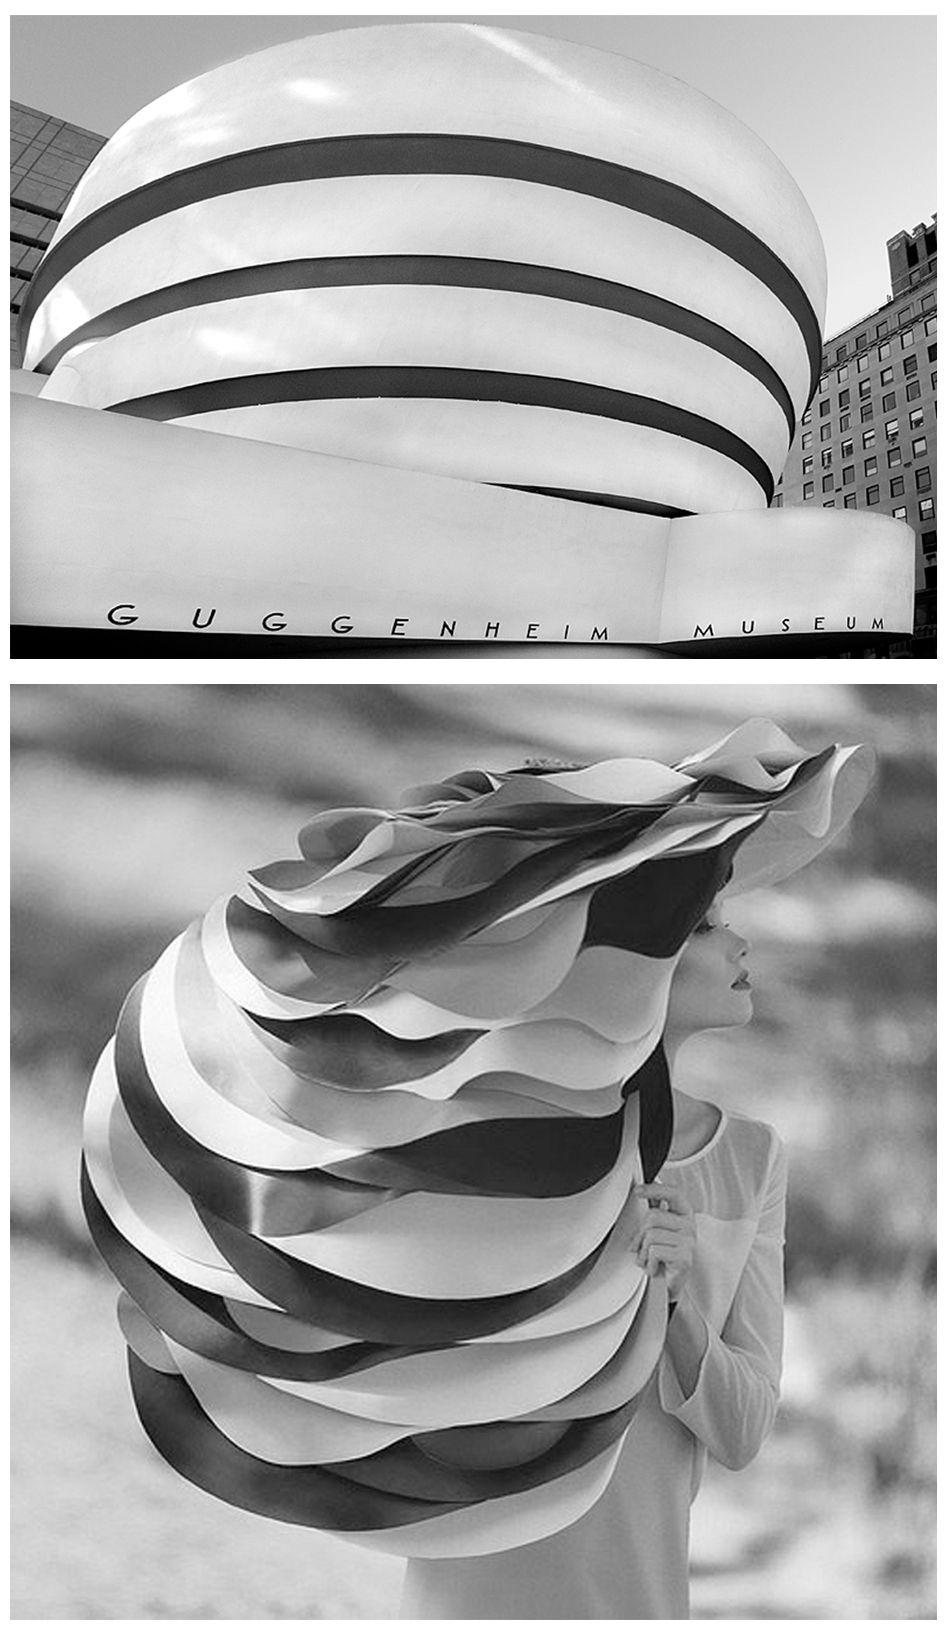 architecture and fashion 1 guggenheim museum new york frank lloyd wright 2 fine art. Black Bedroom Furniture Sets. Home Design Ideas